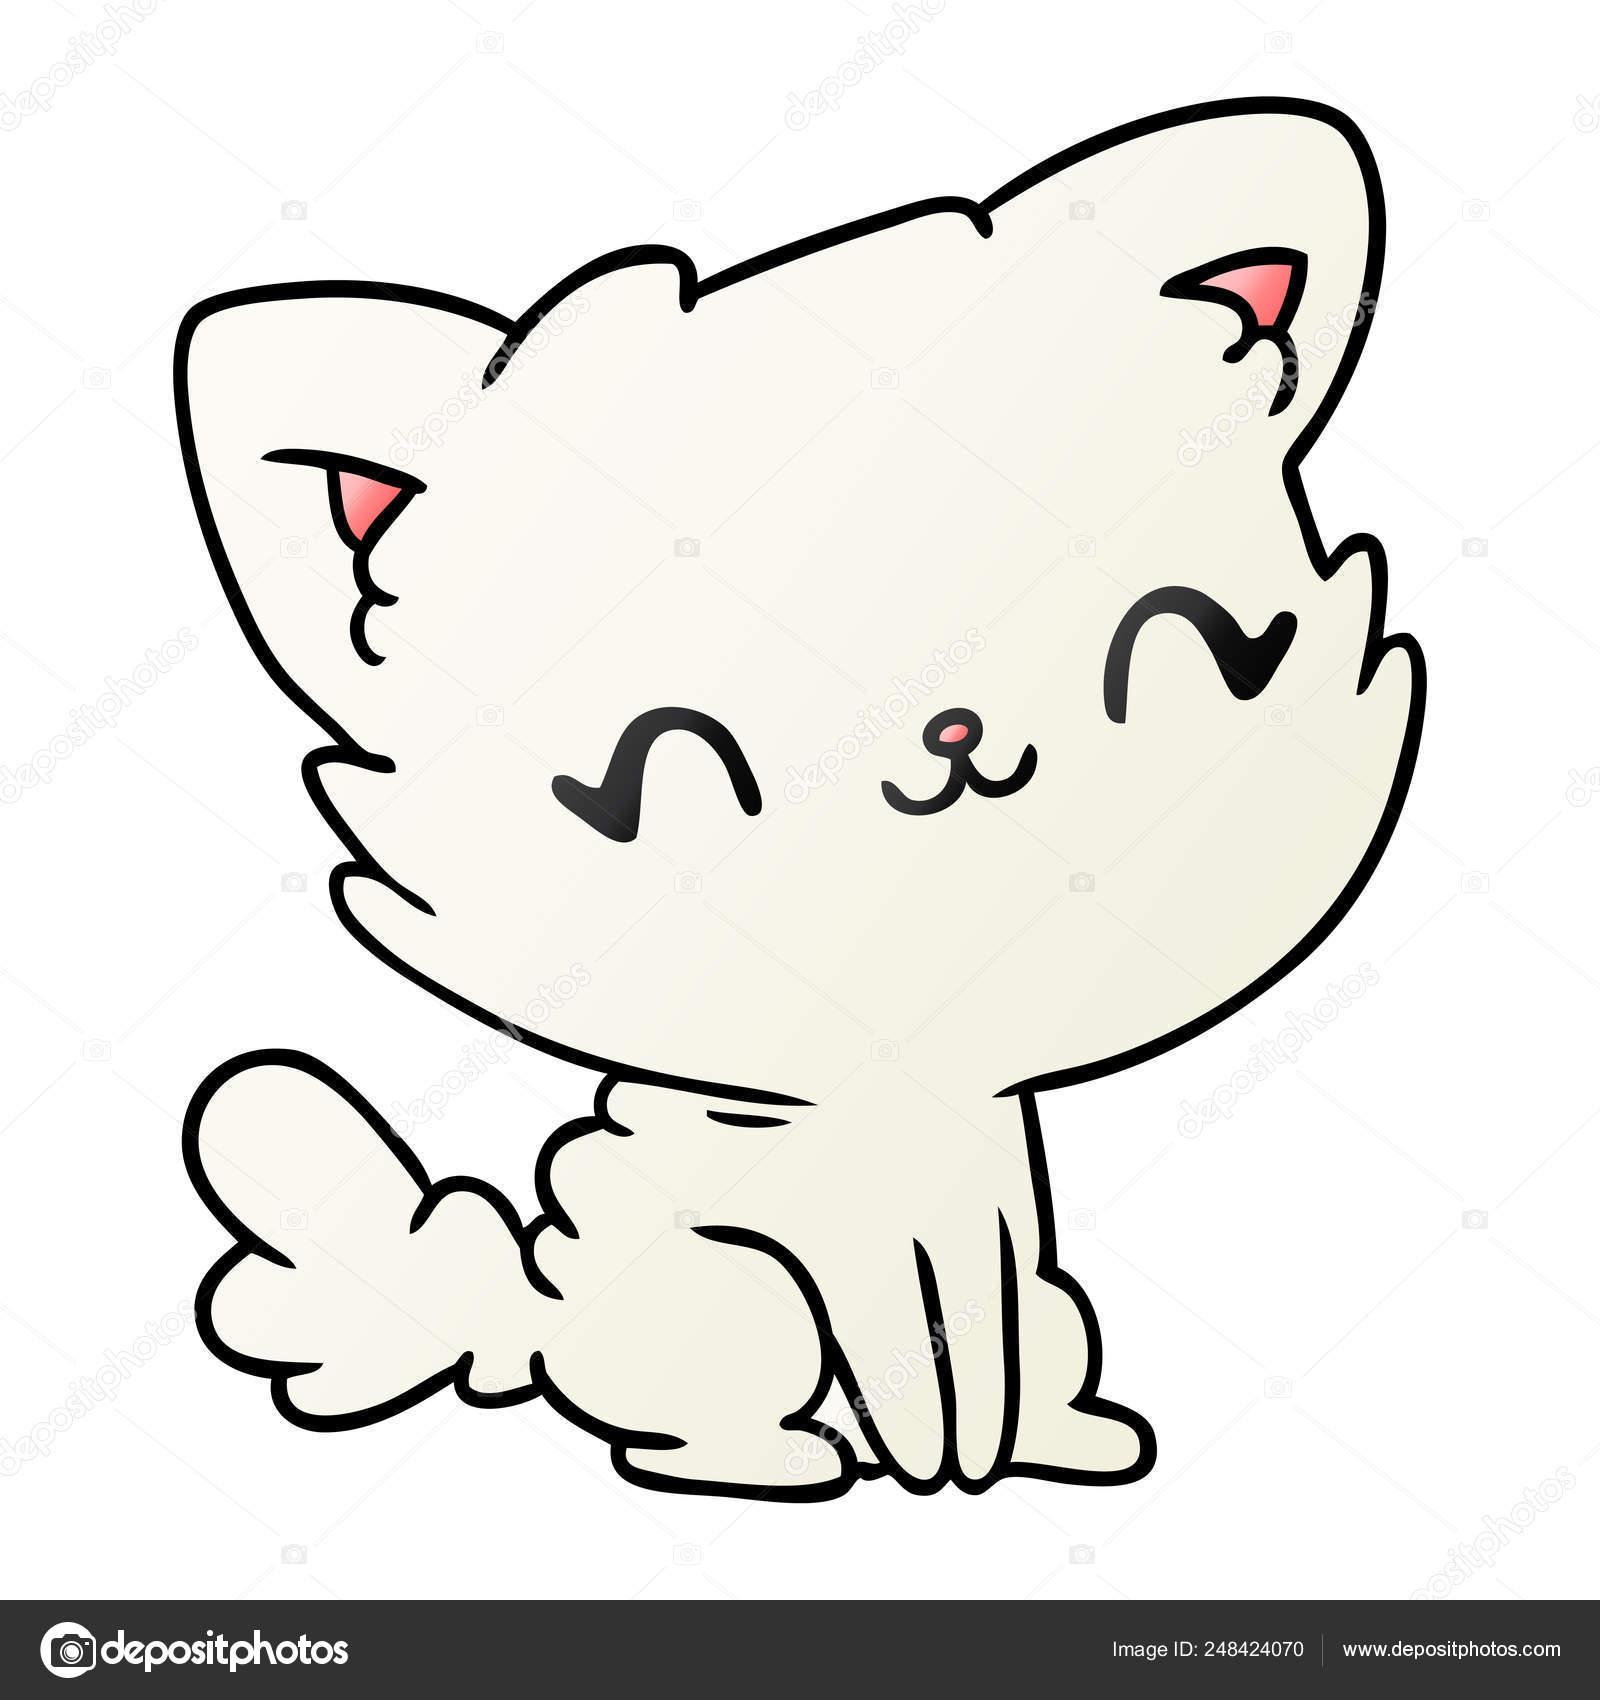 Gradient Cartoon Cute Kawaii Fluffy Cat Stock Vector